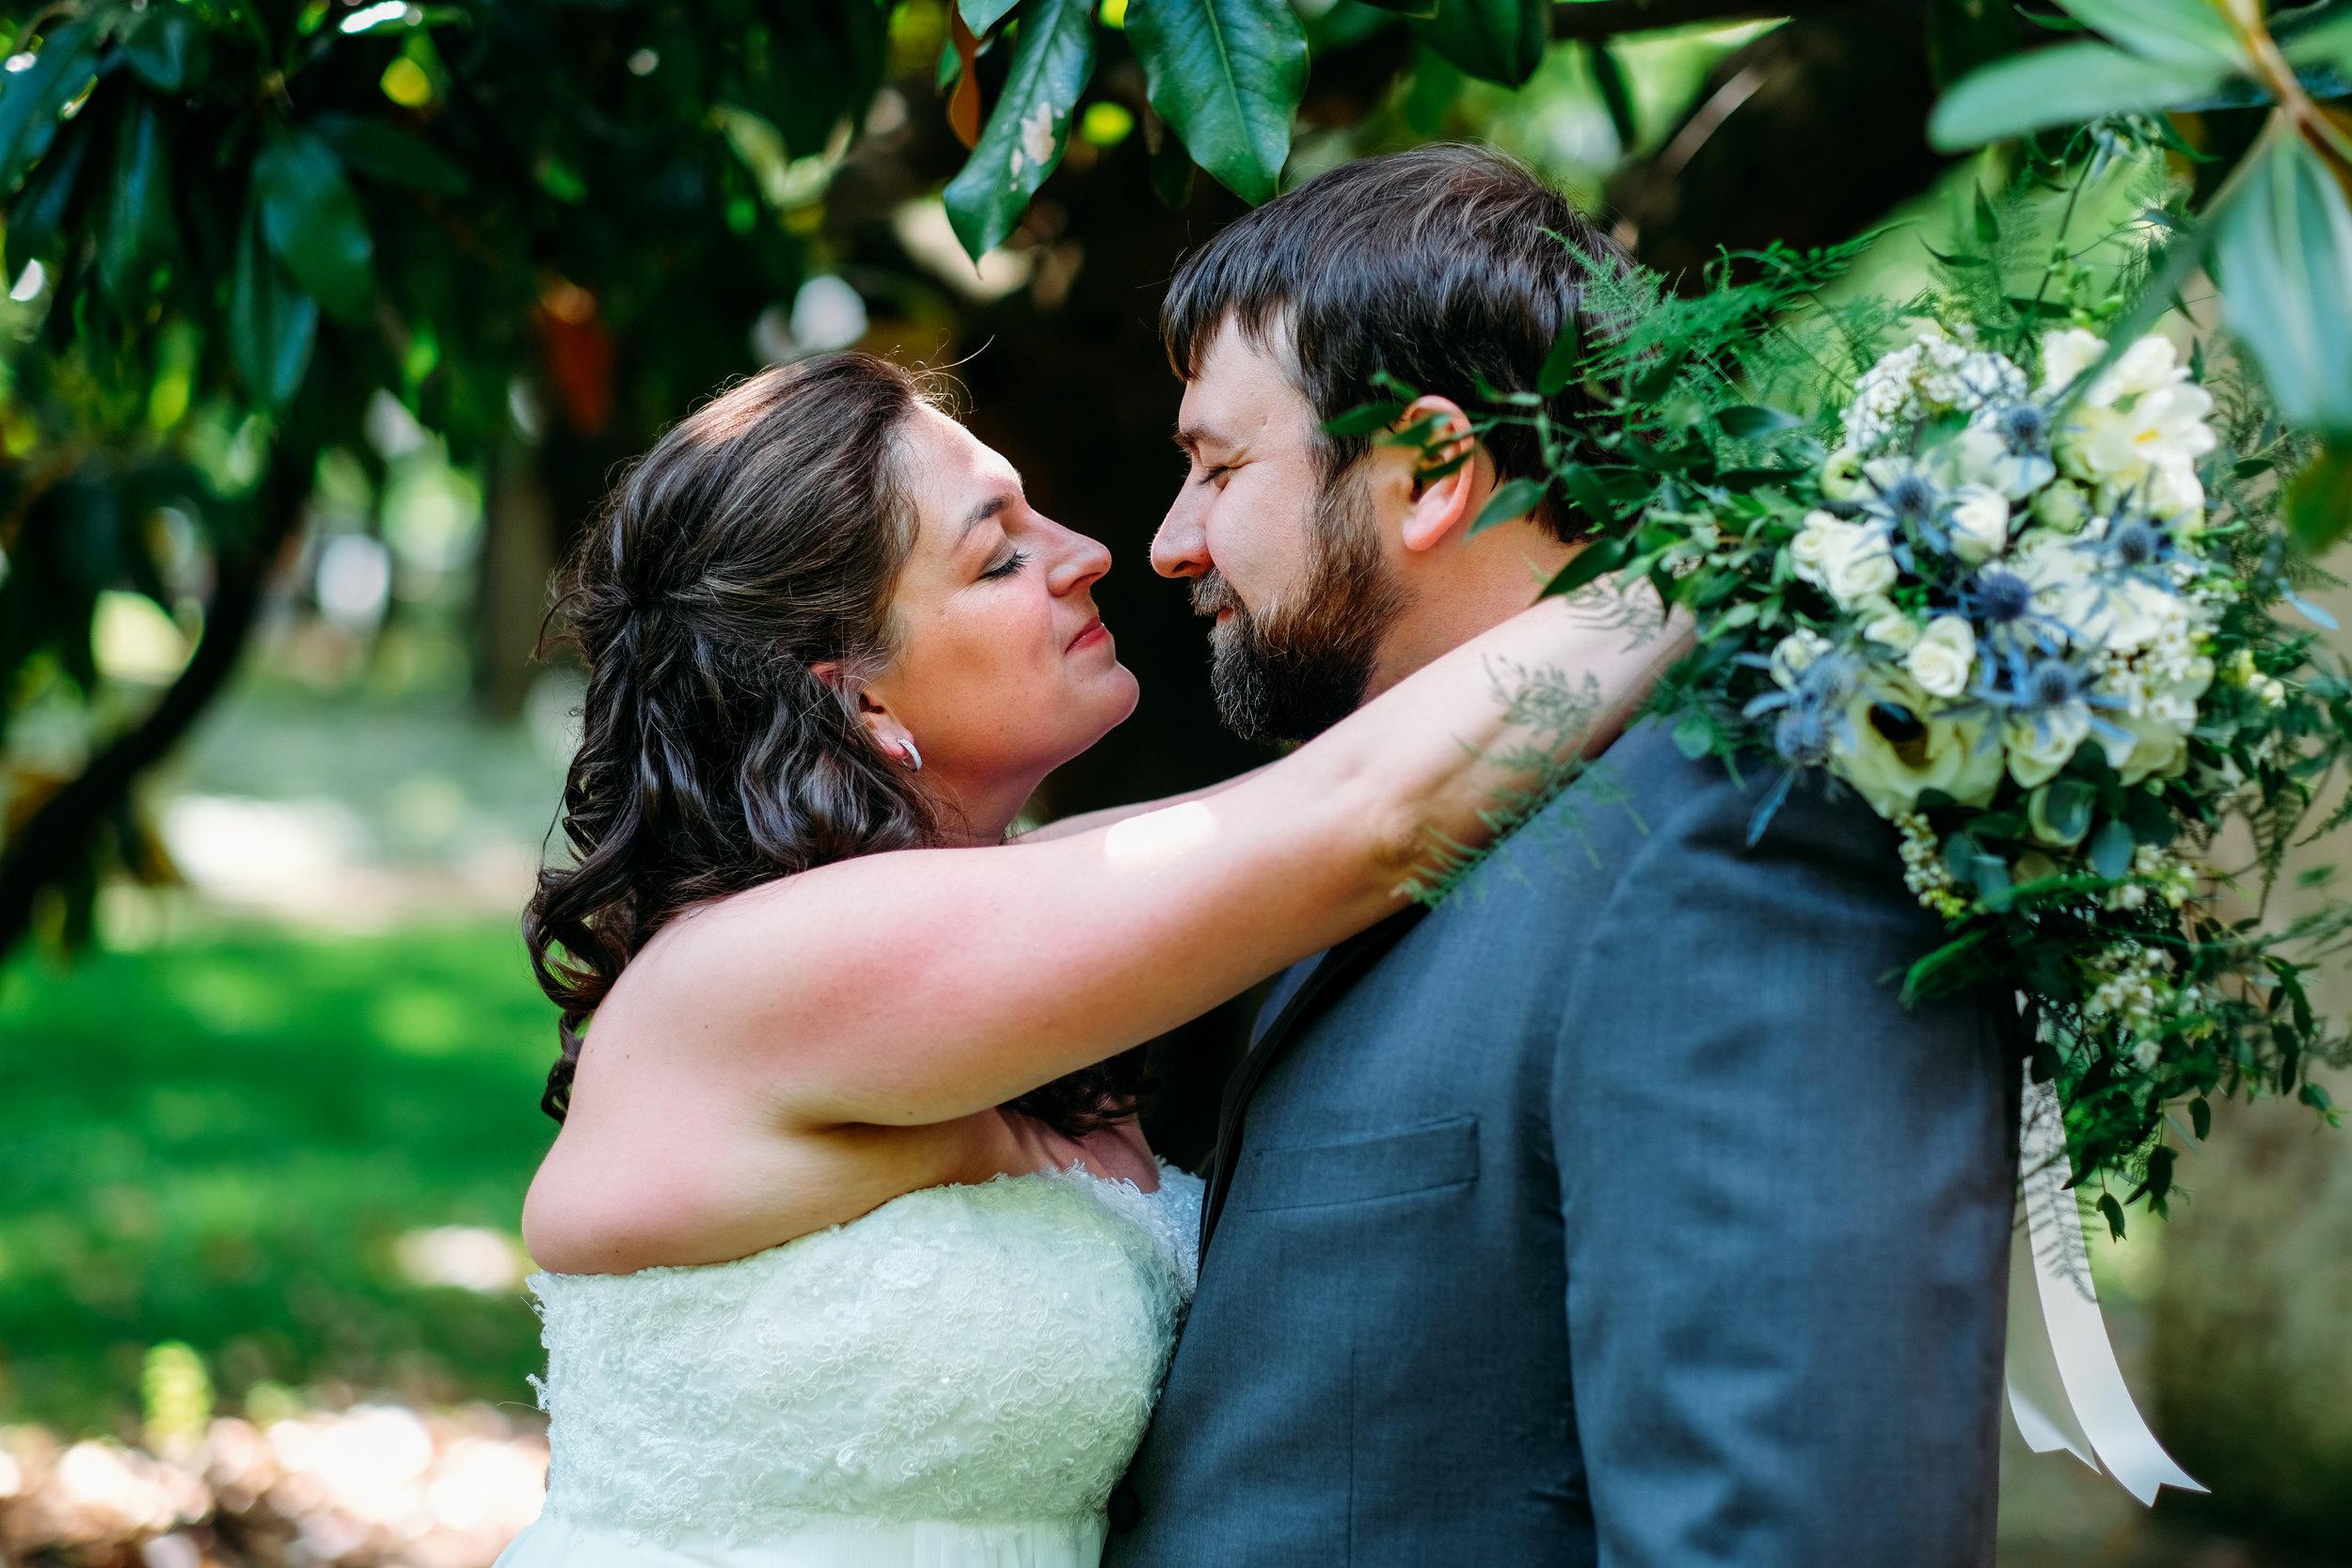 Ashley.Eric.Wedding.Delyn.2016.Mileswittboyer.Photographiccollective-211.jpg